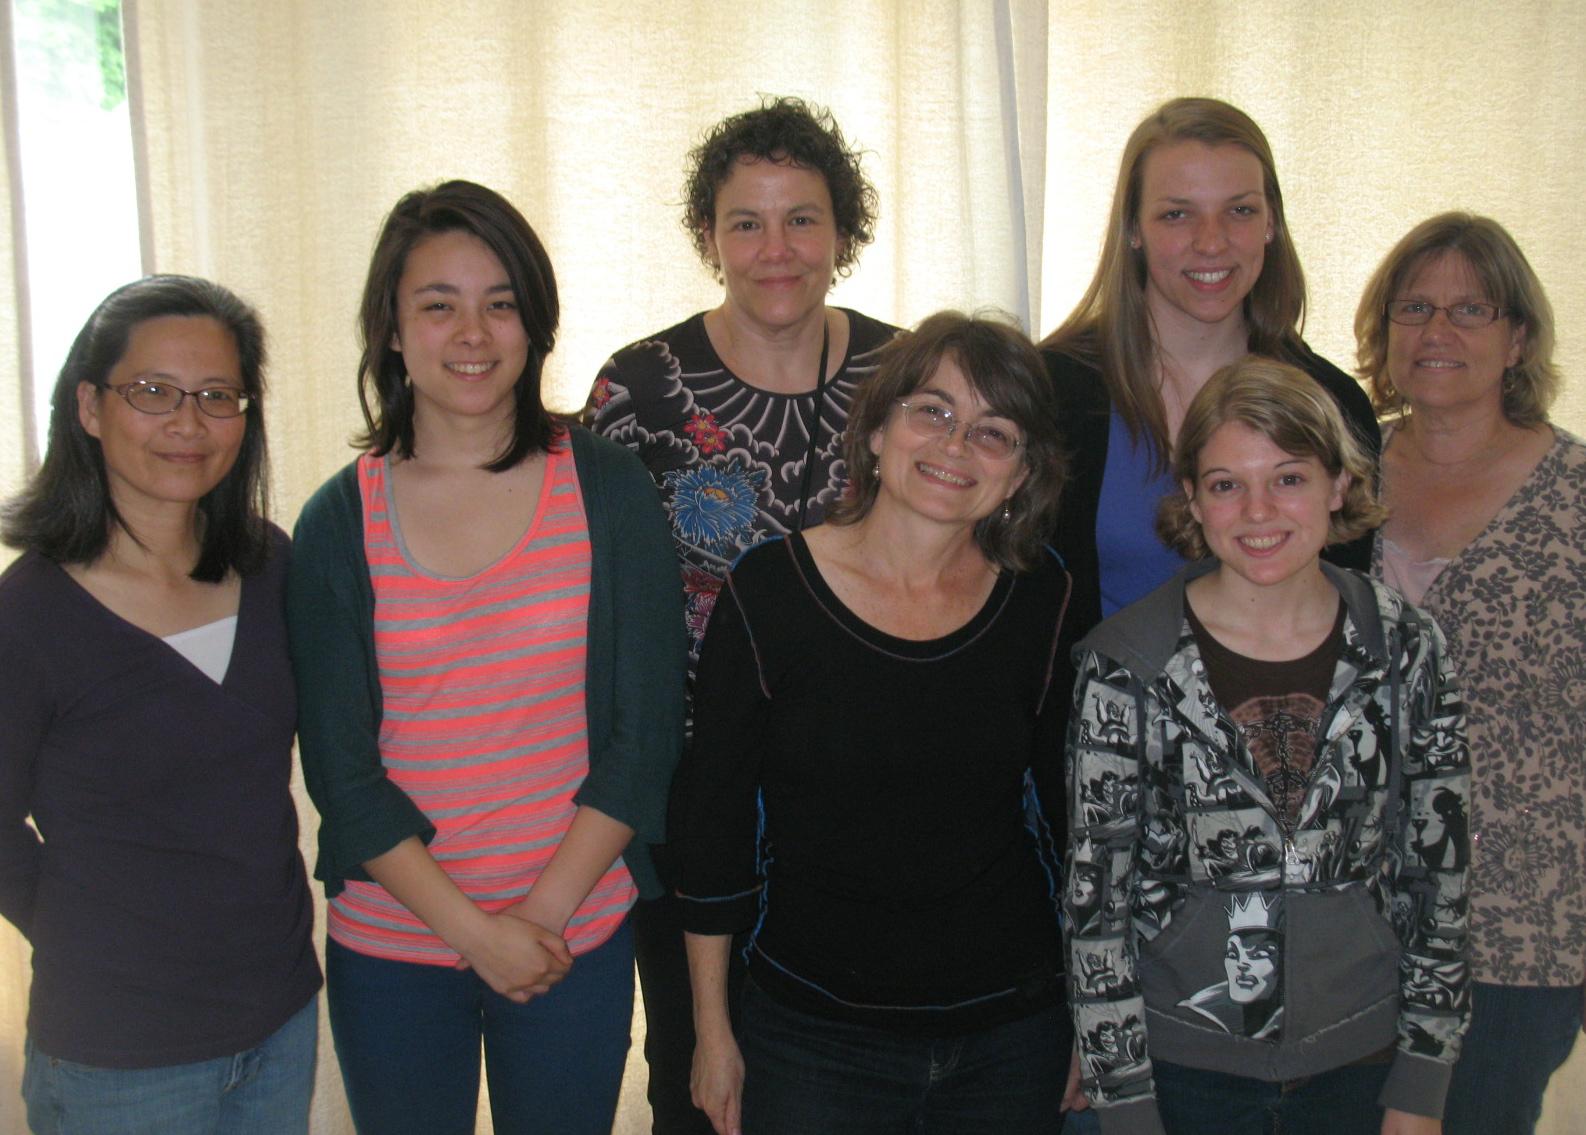 Last book club meeting photo